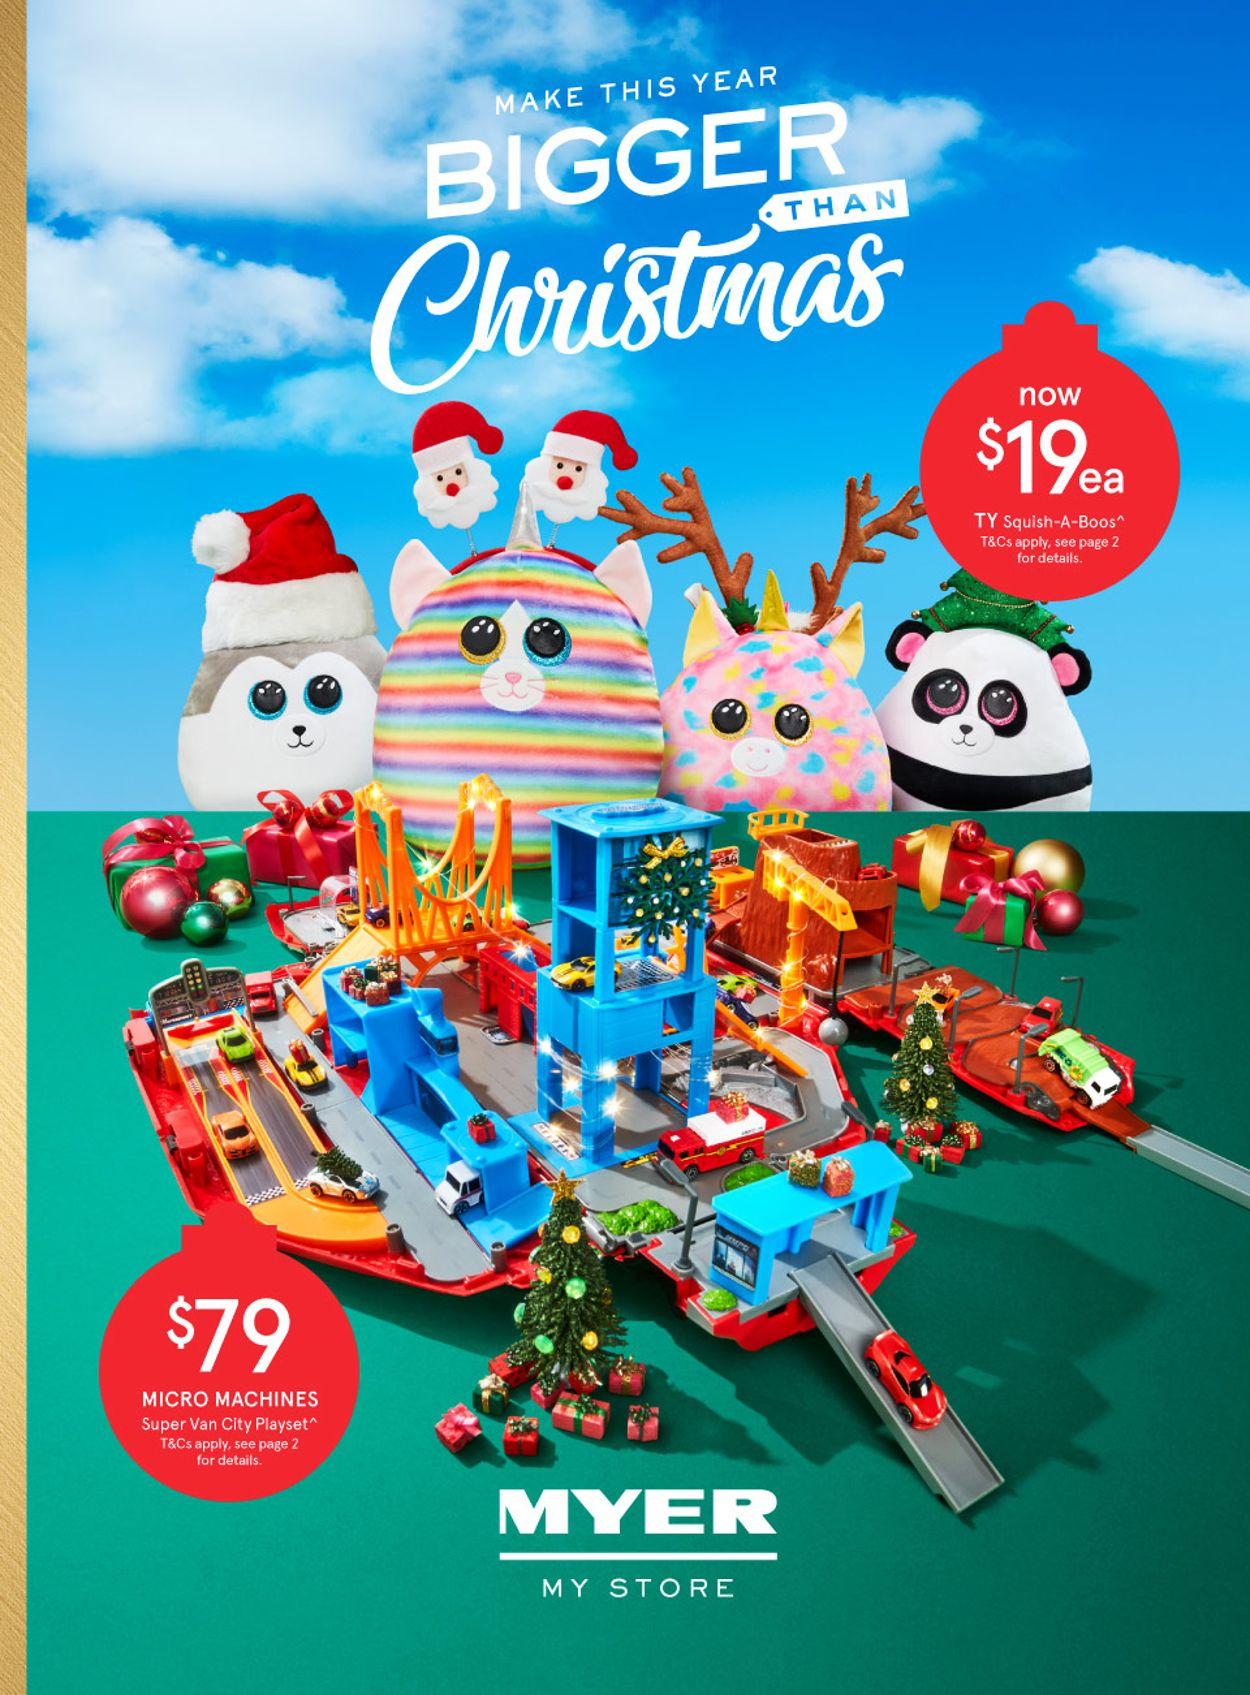 Myer Christmas 2020 Catalogue - 09/11-24/12/2020